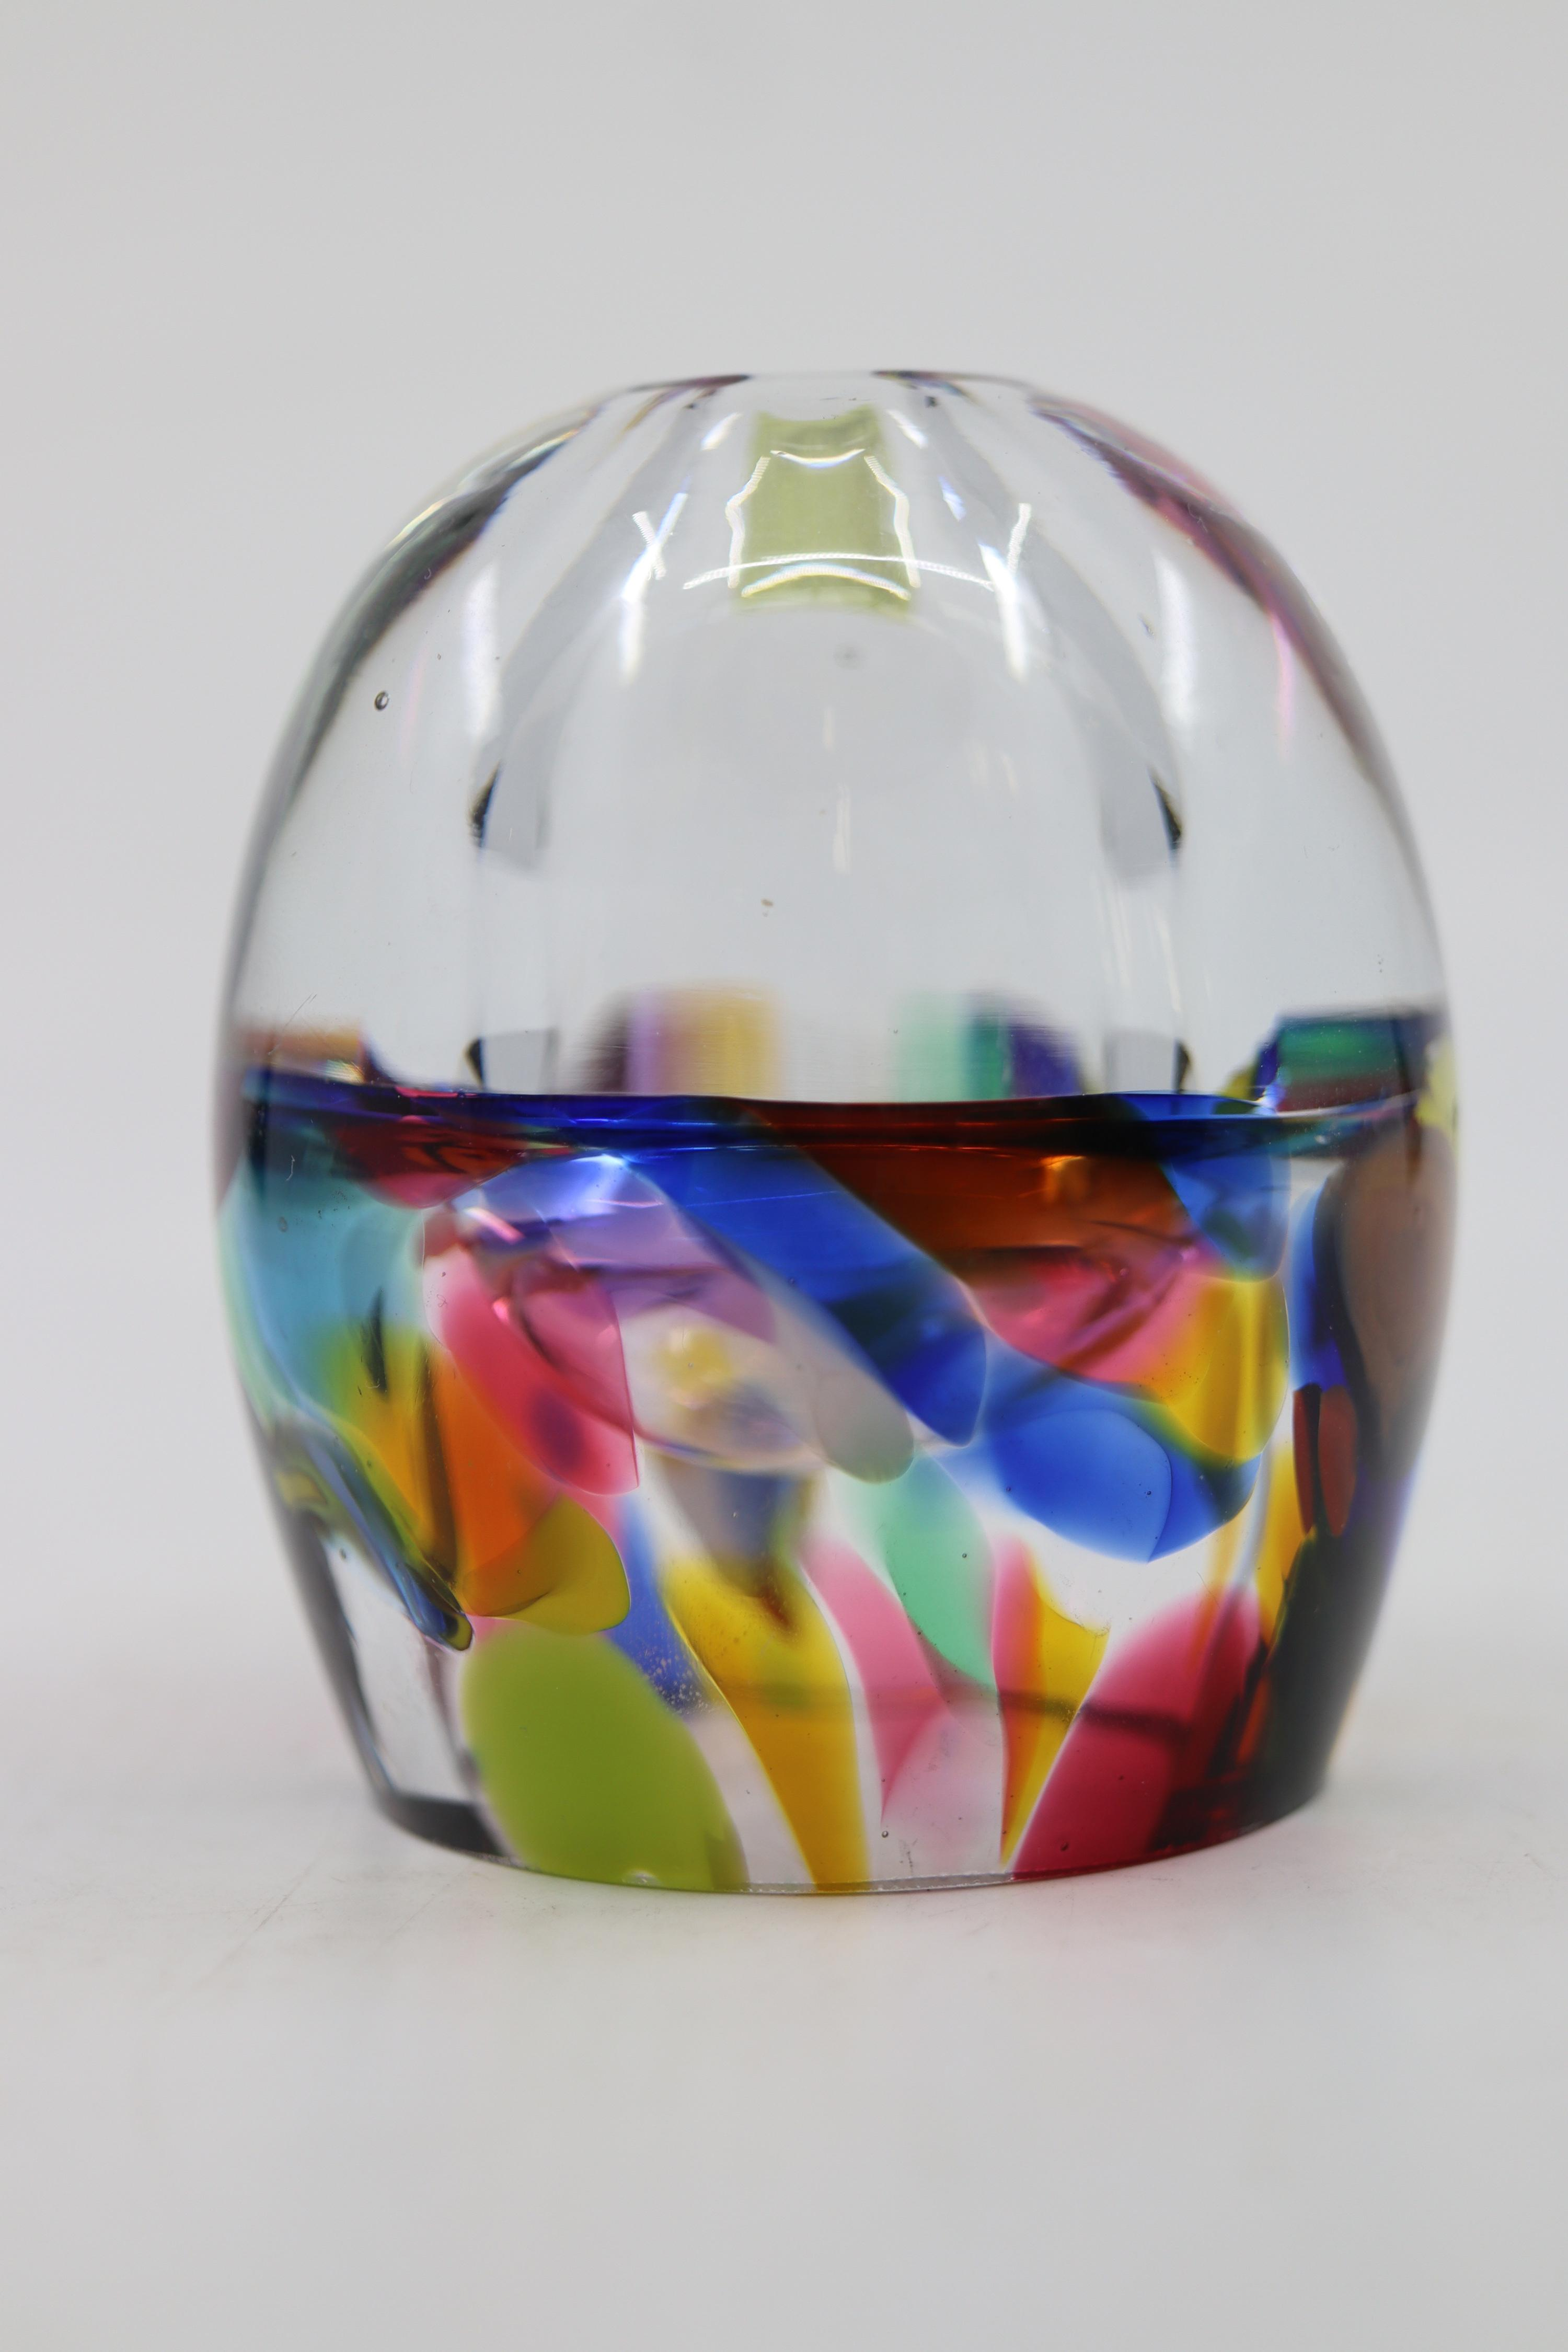 BEAUTIFUL ART GLASS BUD VASE/PAPERWEIGHT NO CHIPS CRACKS OR REPAIRS